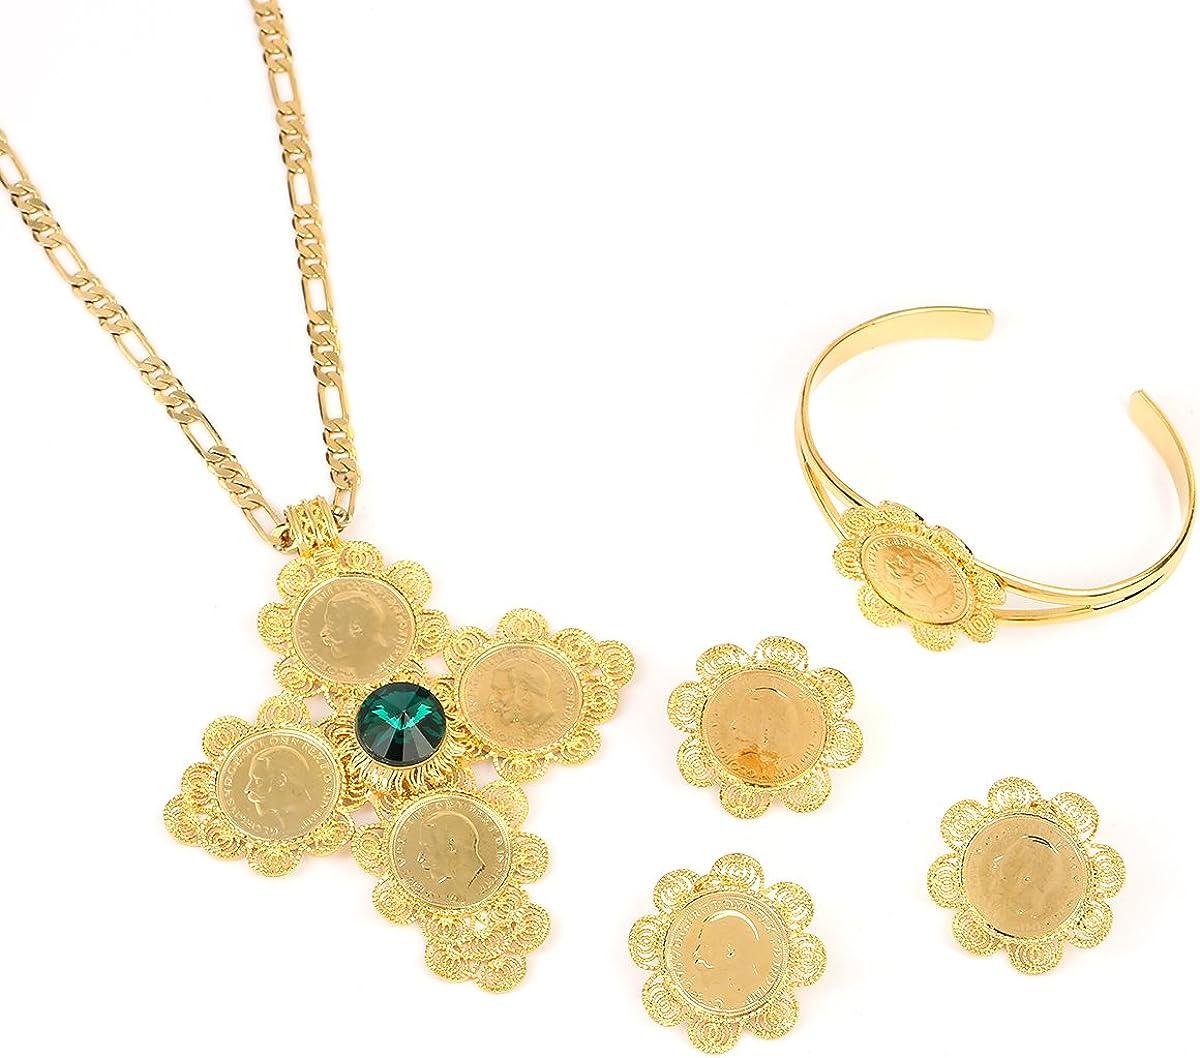 Coin Jewelry Sets Ethiopian Gold Coin Bridal Wedding Eritrea Habesha Jewelry